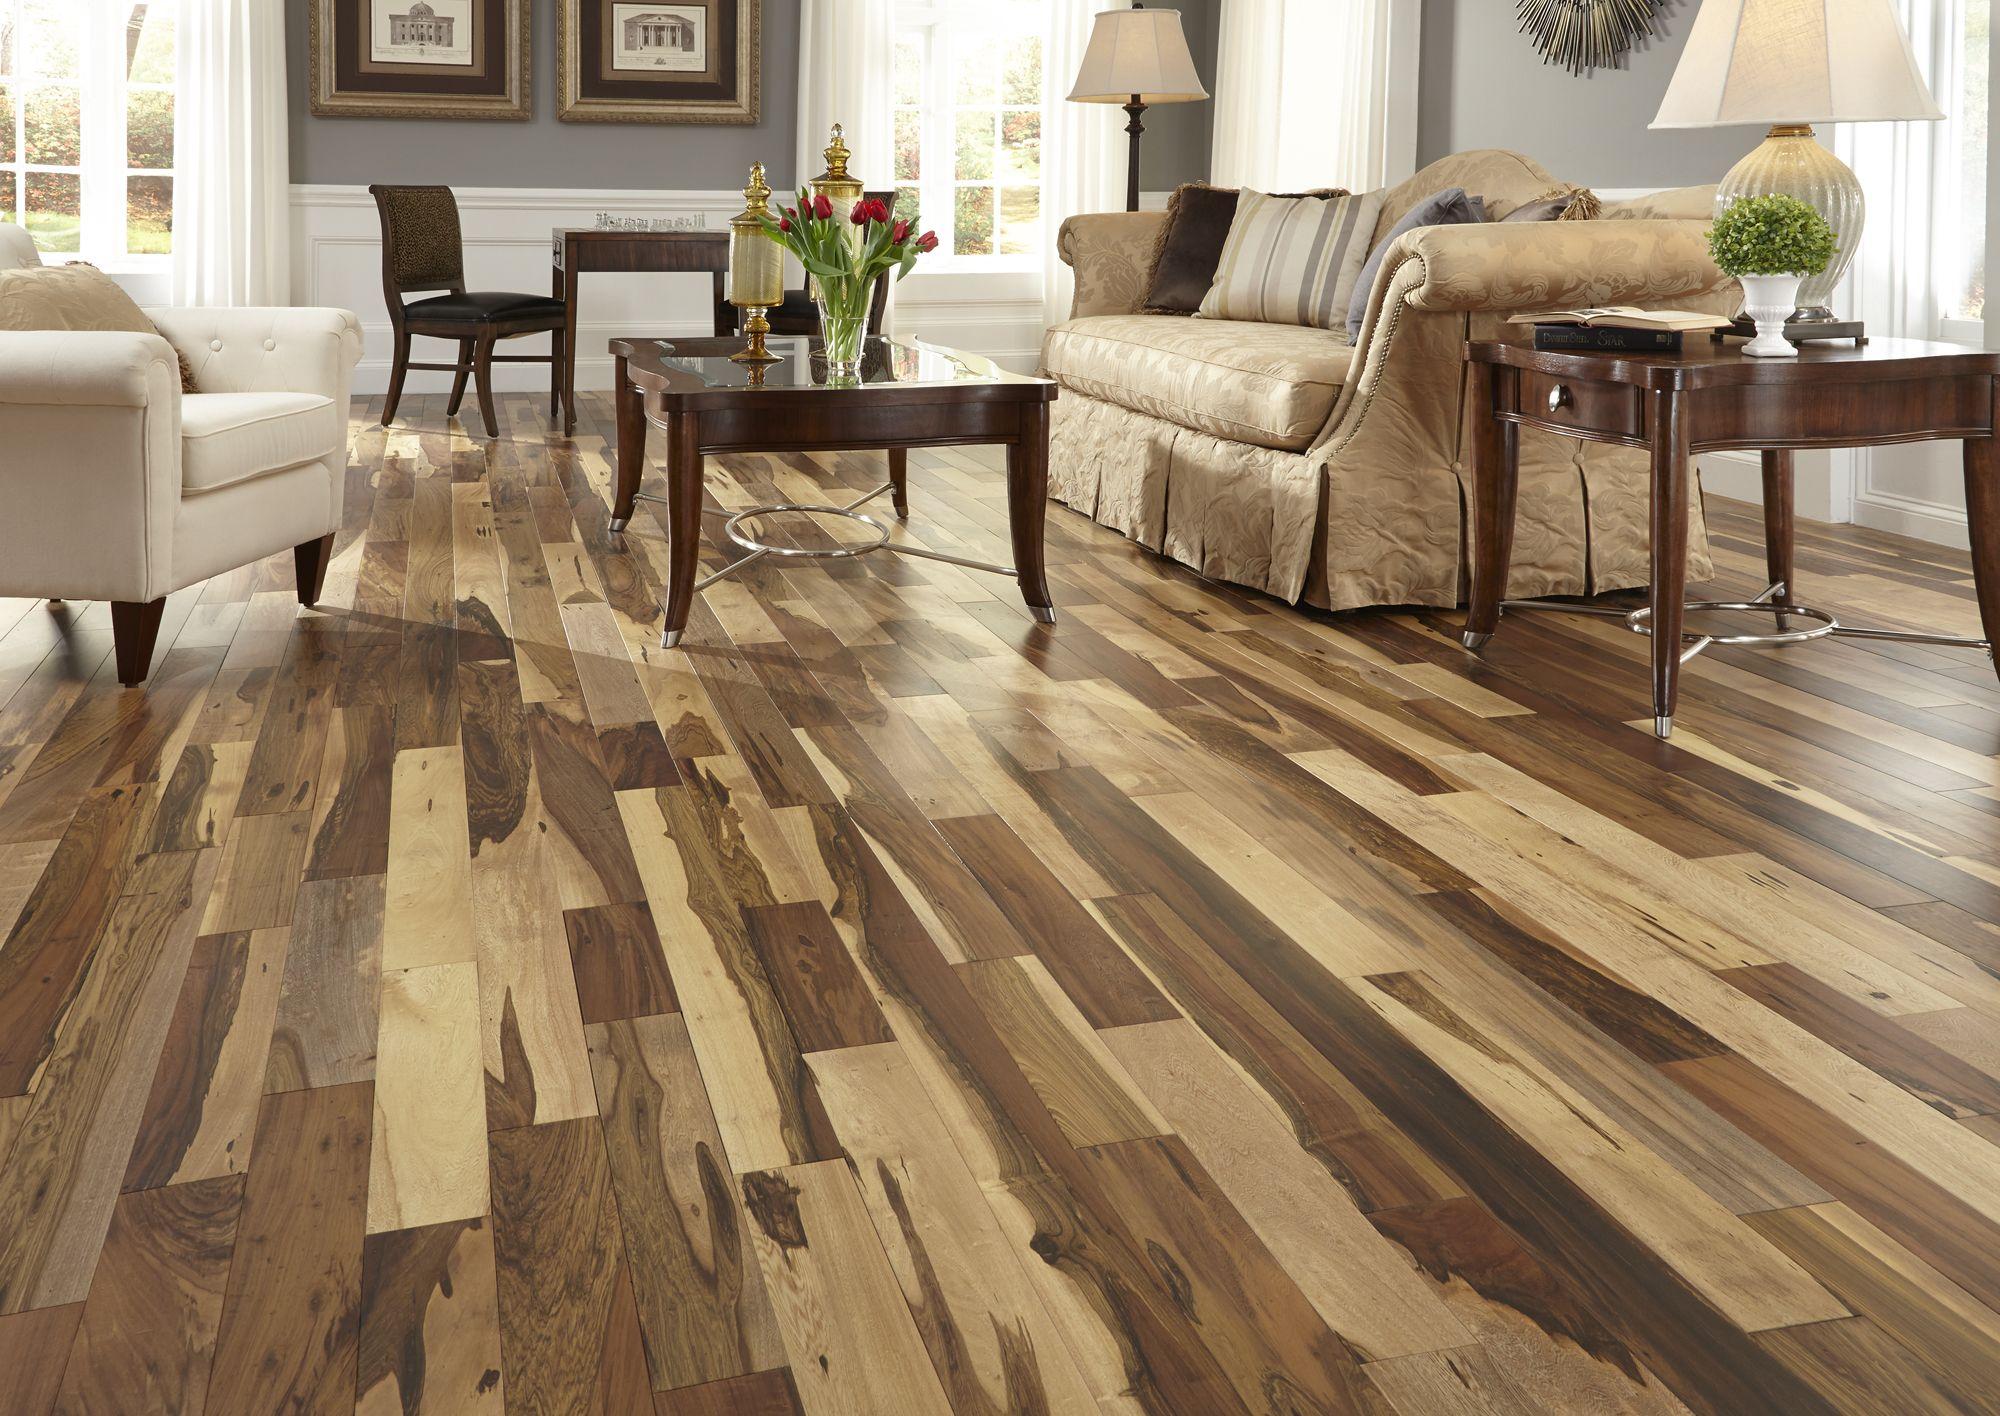 Bellawood Matte Brazilian Pecan Natural Flooring 3 4 X 4